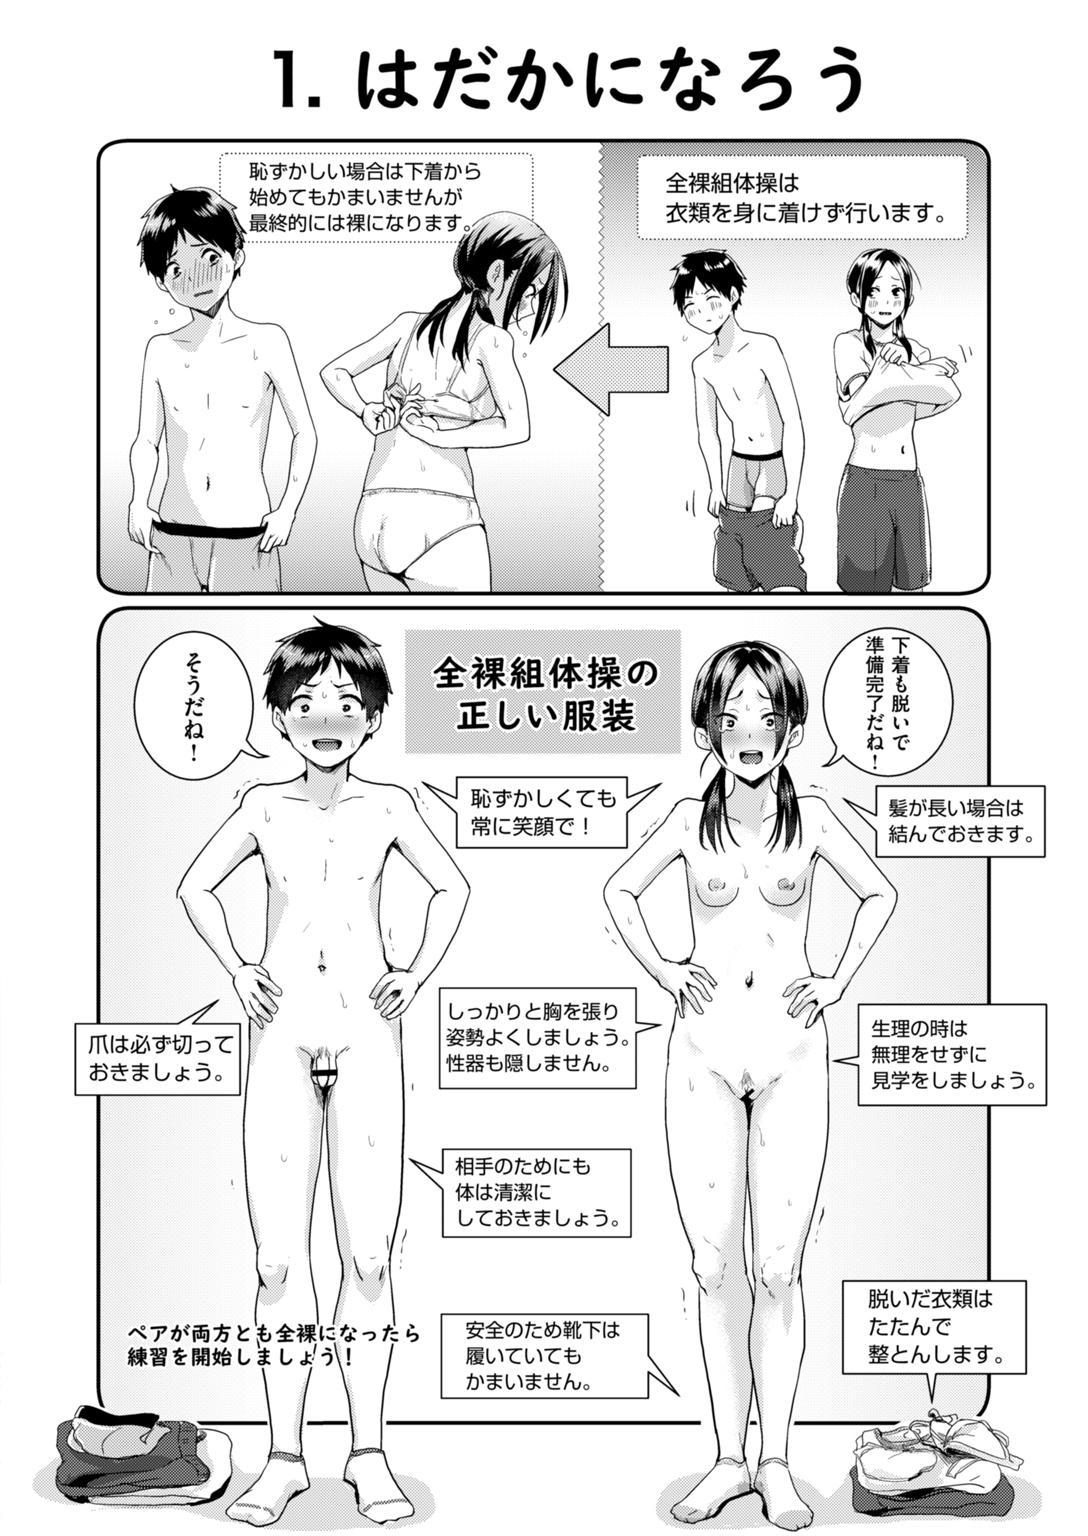 COMIC HAPPINING Vol. 2 36